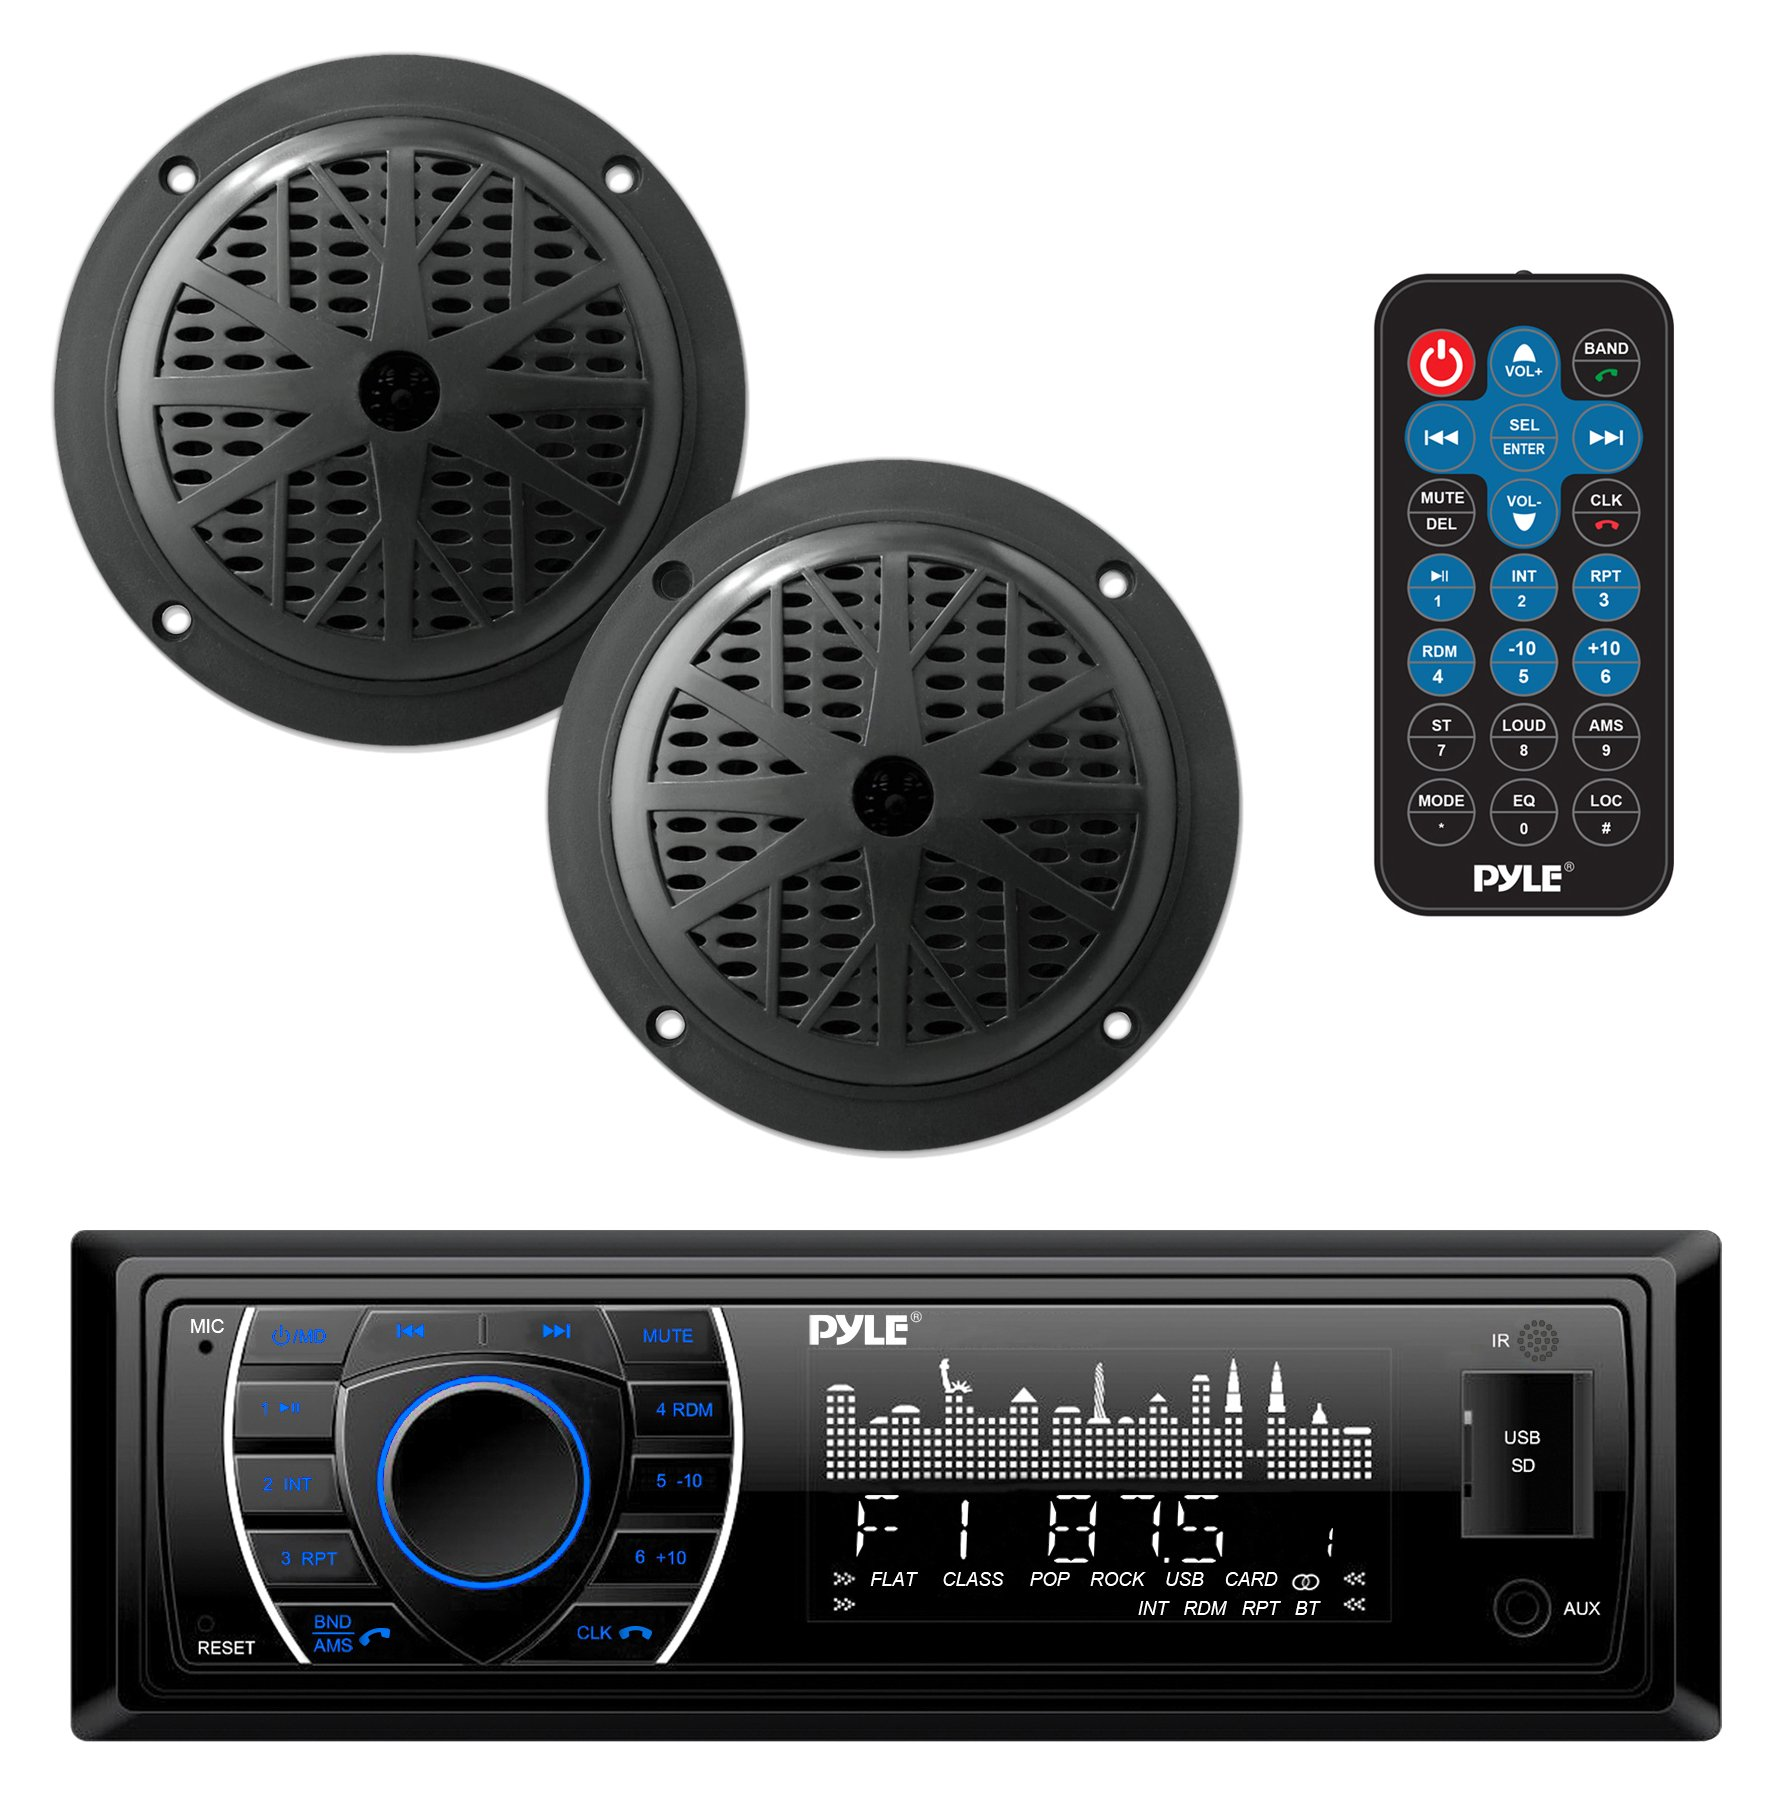 Marine Headunit Receiver Speaker Kit - In-Dash LCD Digital Stereo Built-in Bluetooth & Microphone w/AM FM Radio System 5.25'' Waterproof Speakers (2) MP3/SD Readers & Remote Control - Pyle PLMRKT46BK